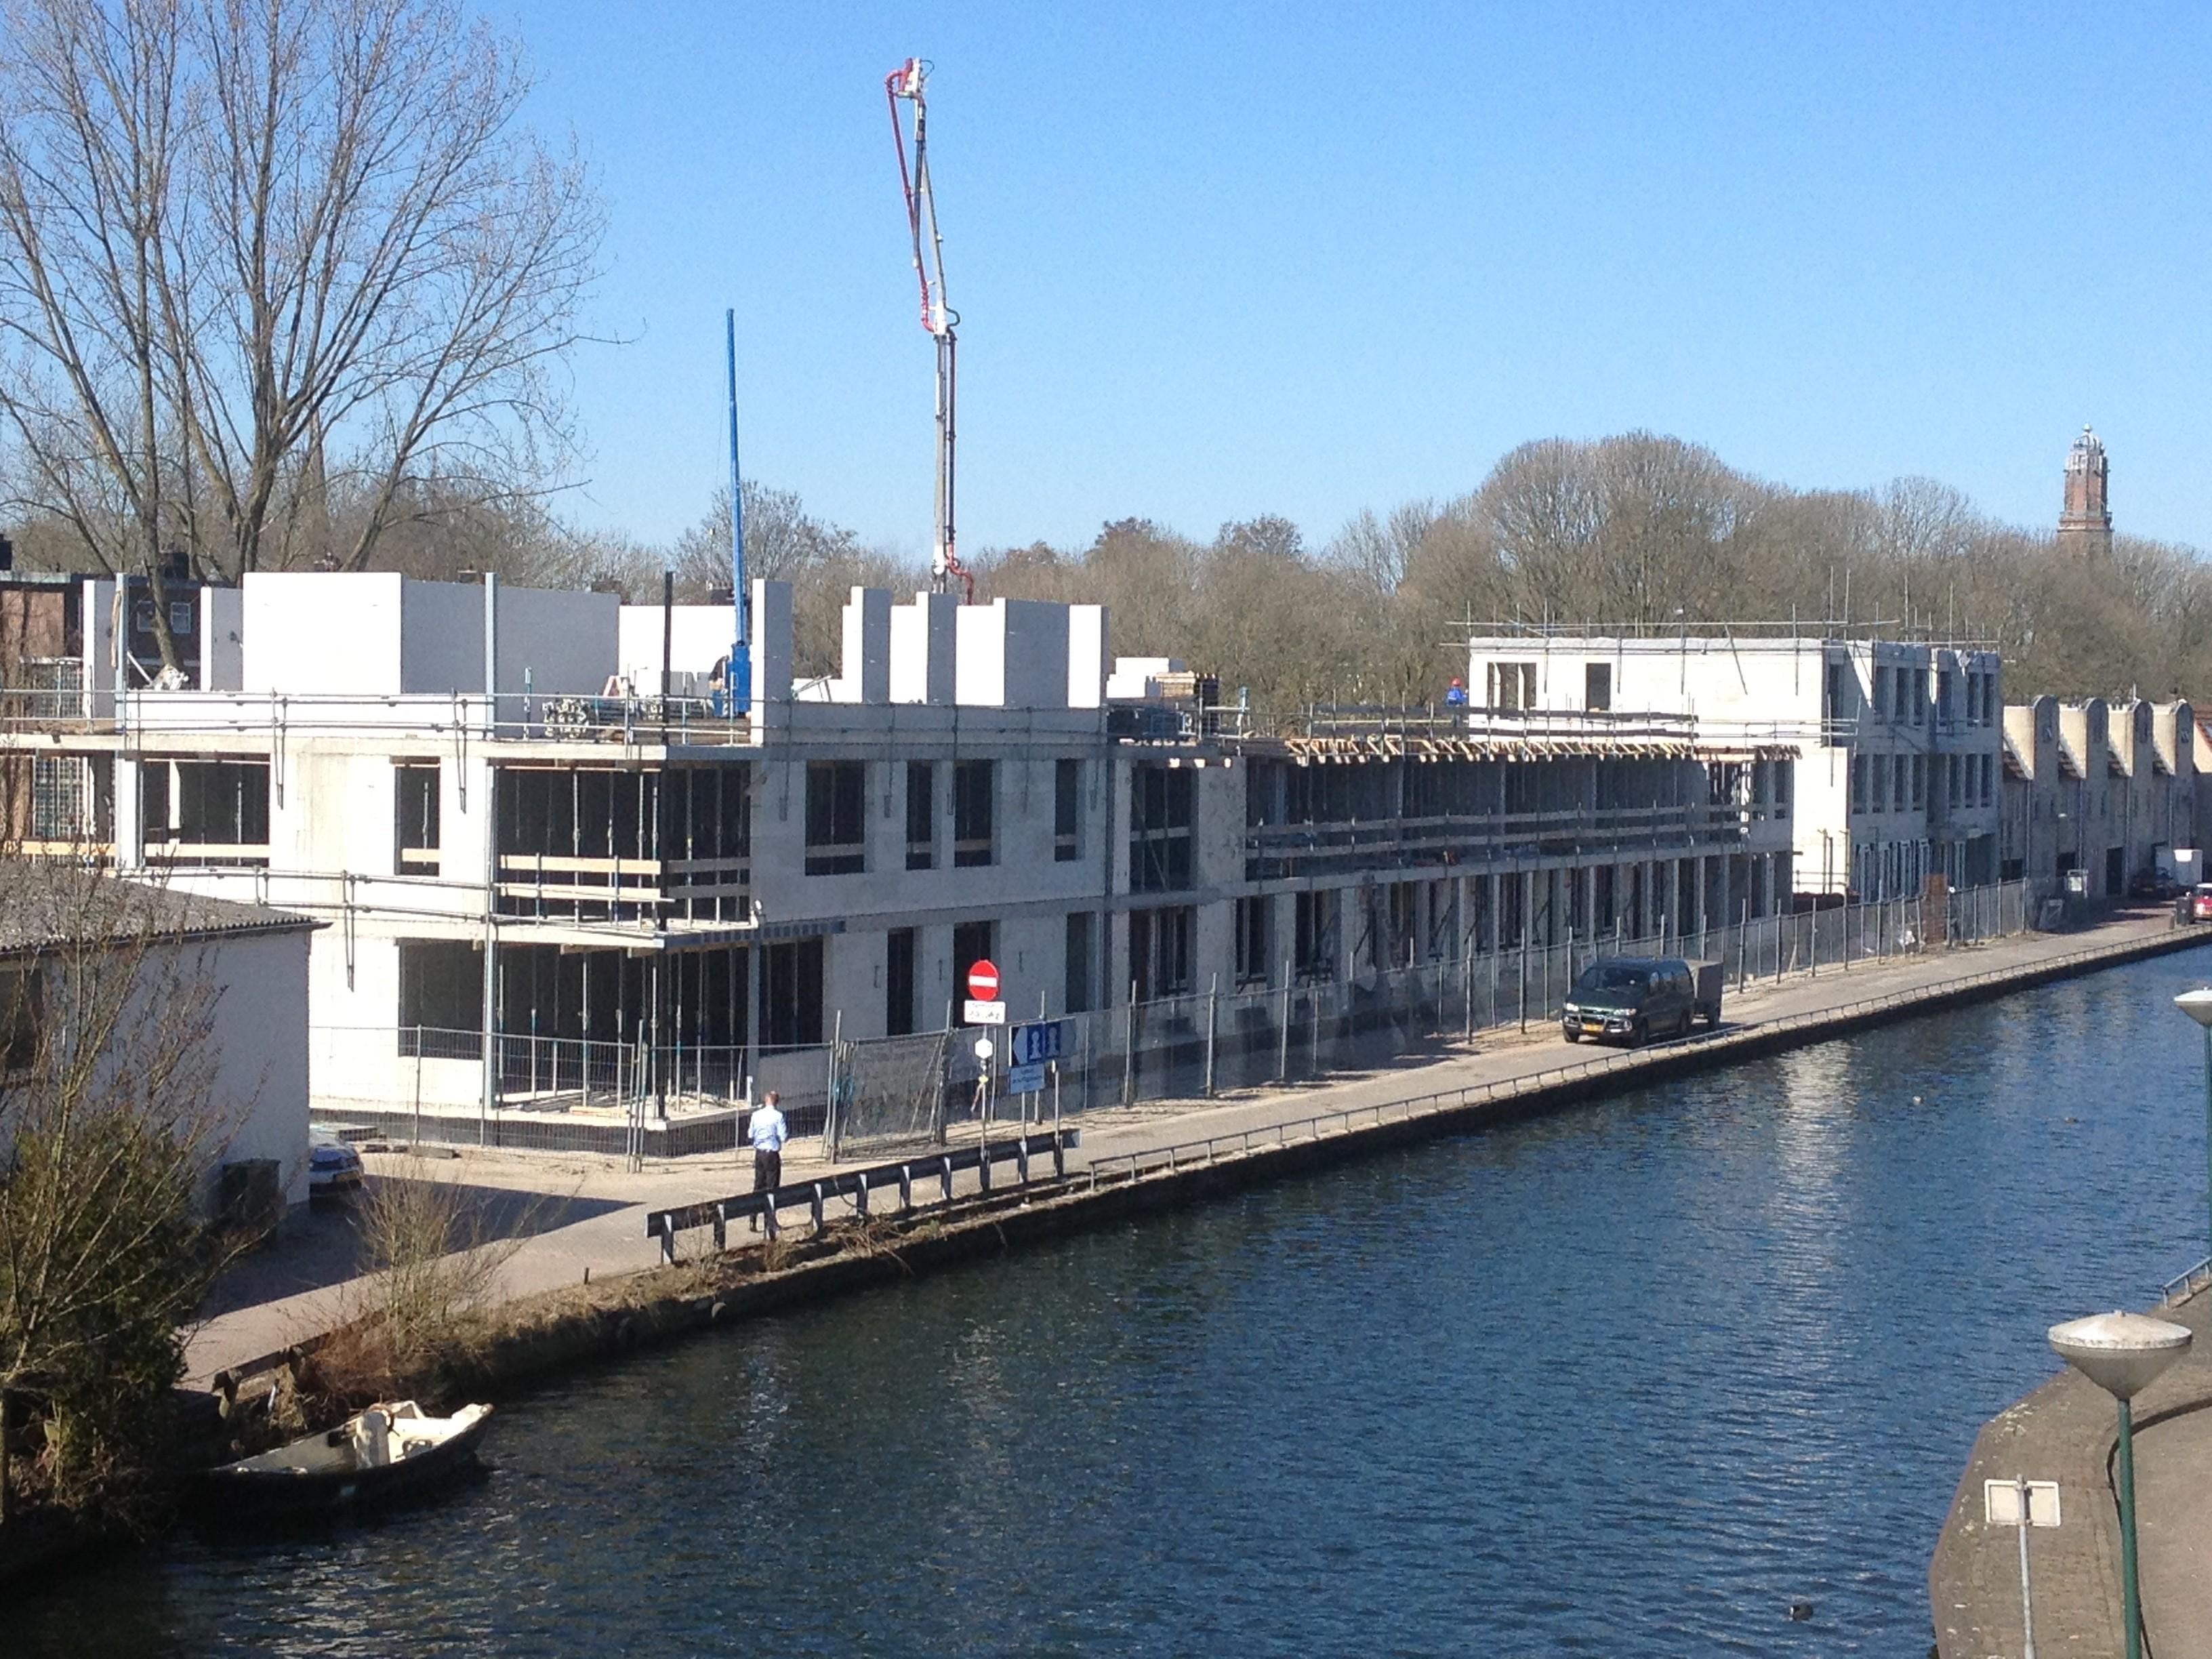 BKT_provides_devriesenverburg_IJsselstein_appartementen_Panoven_parkeerkelder_schuindak_metslwerk_zink_bouwbord_Cubord_Esbi_09.jpg